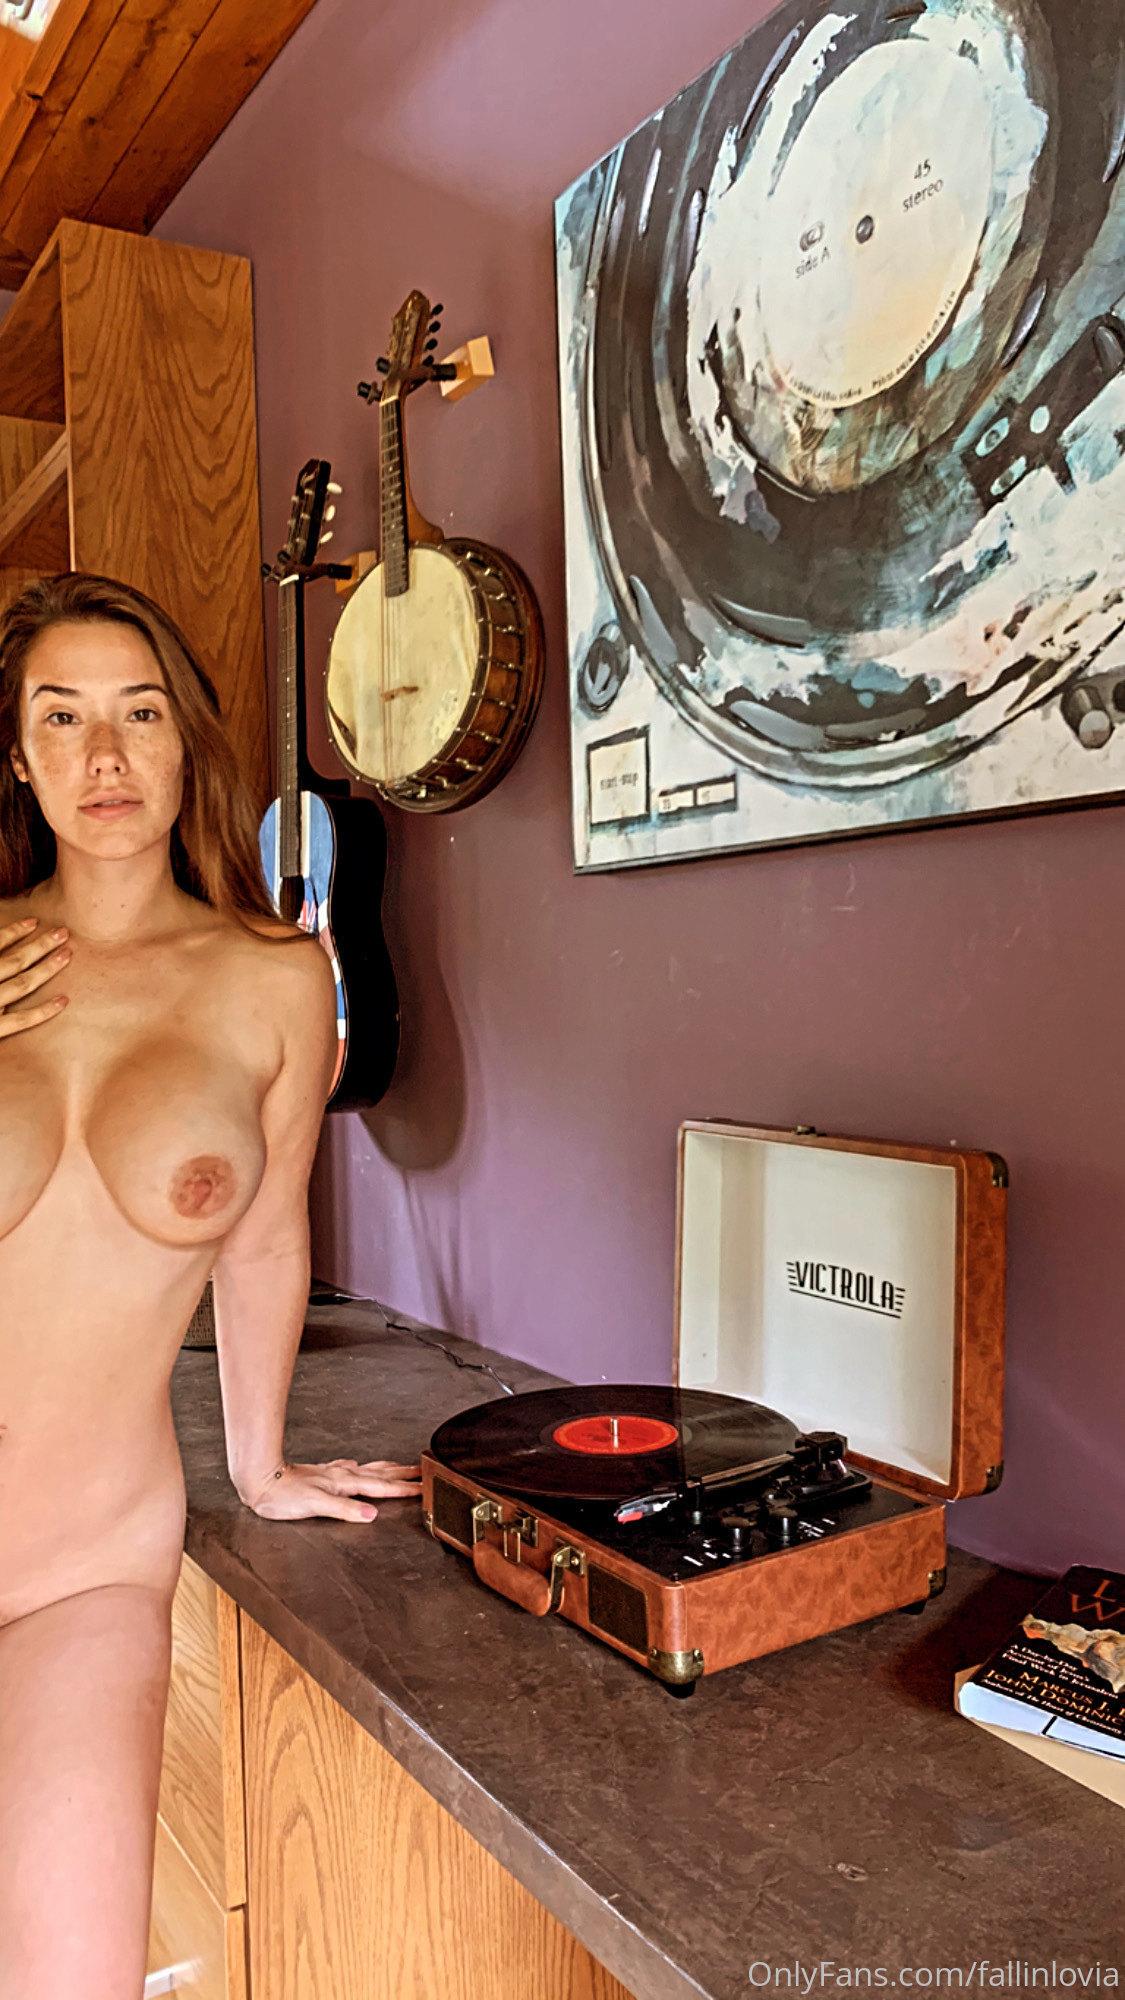 Eva Lovia, Fallinlovia, Onlyfans 0131